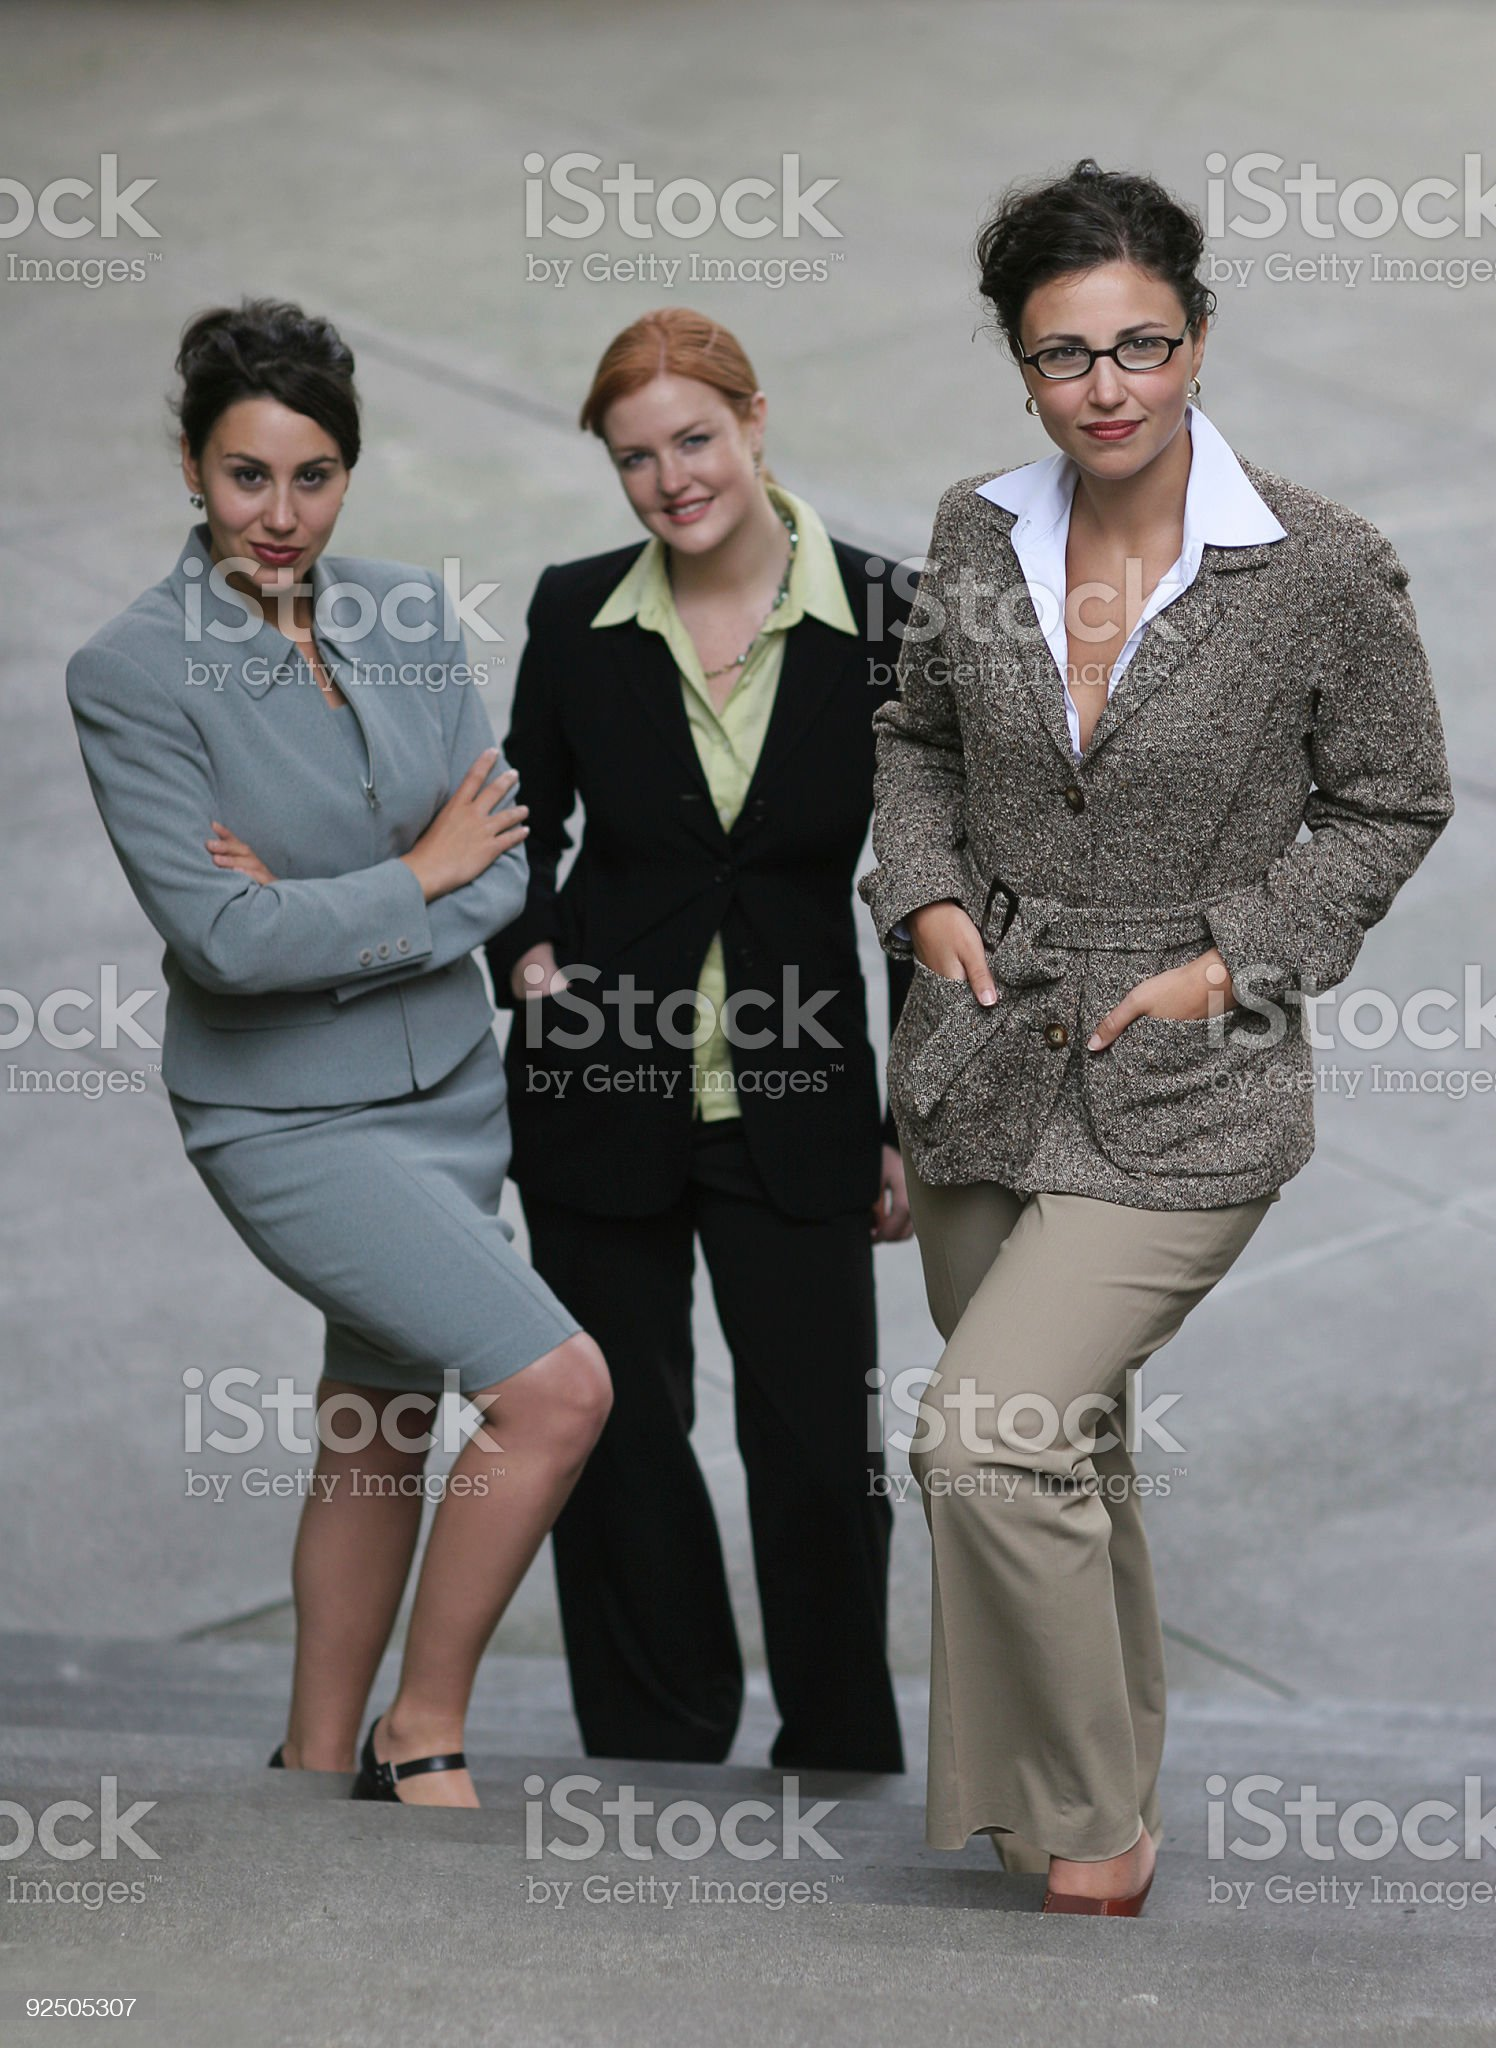 Feminine Business royalty-free stock photo